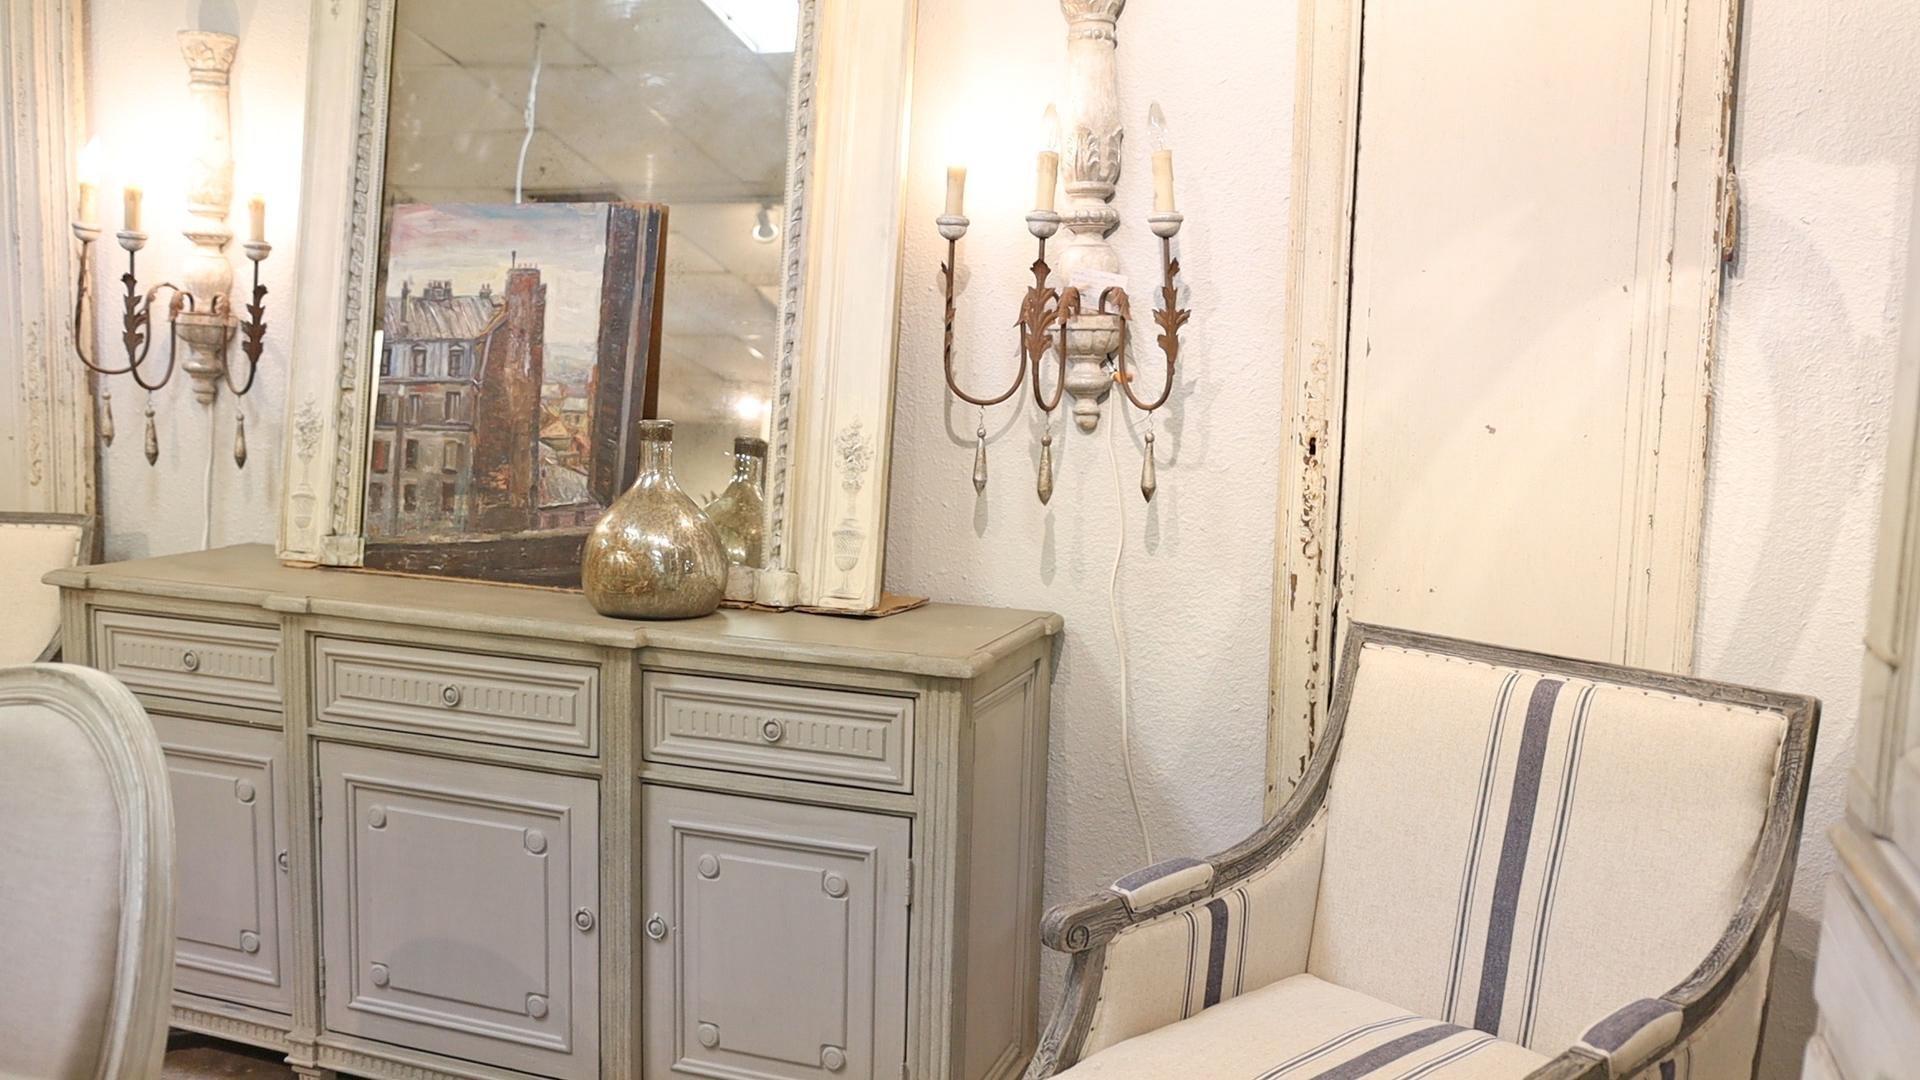 Neutral rustic colors in a showroom design